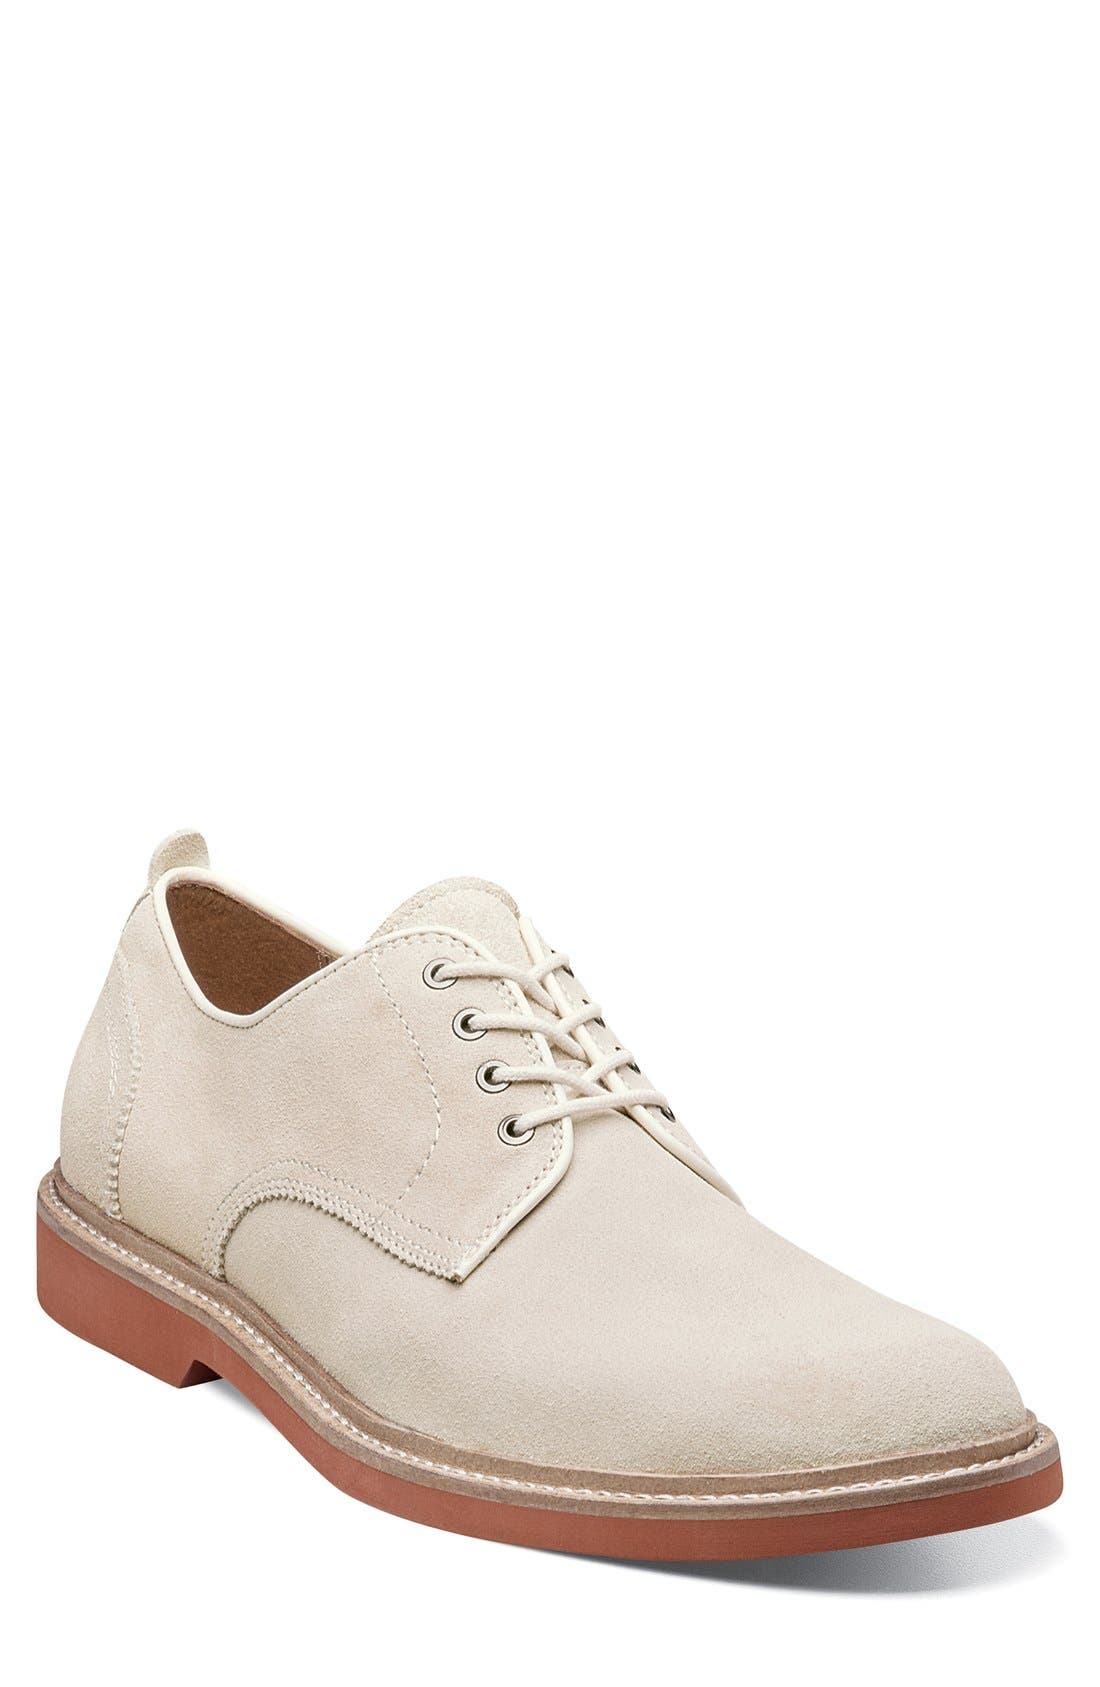 'Bucktown' Buck Shoe,                             Main thumbnail 1, color,                             WHITE SUEDE